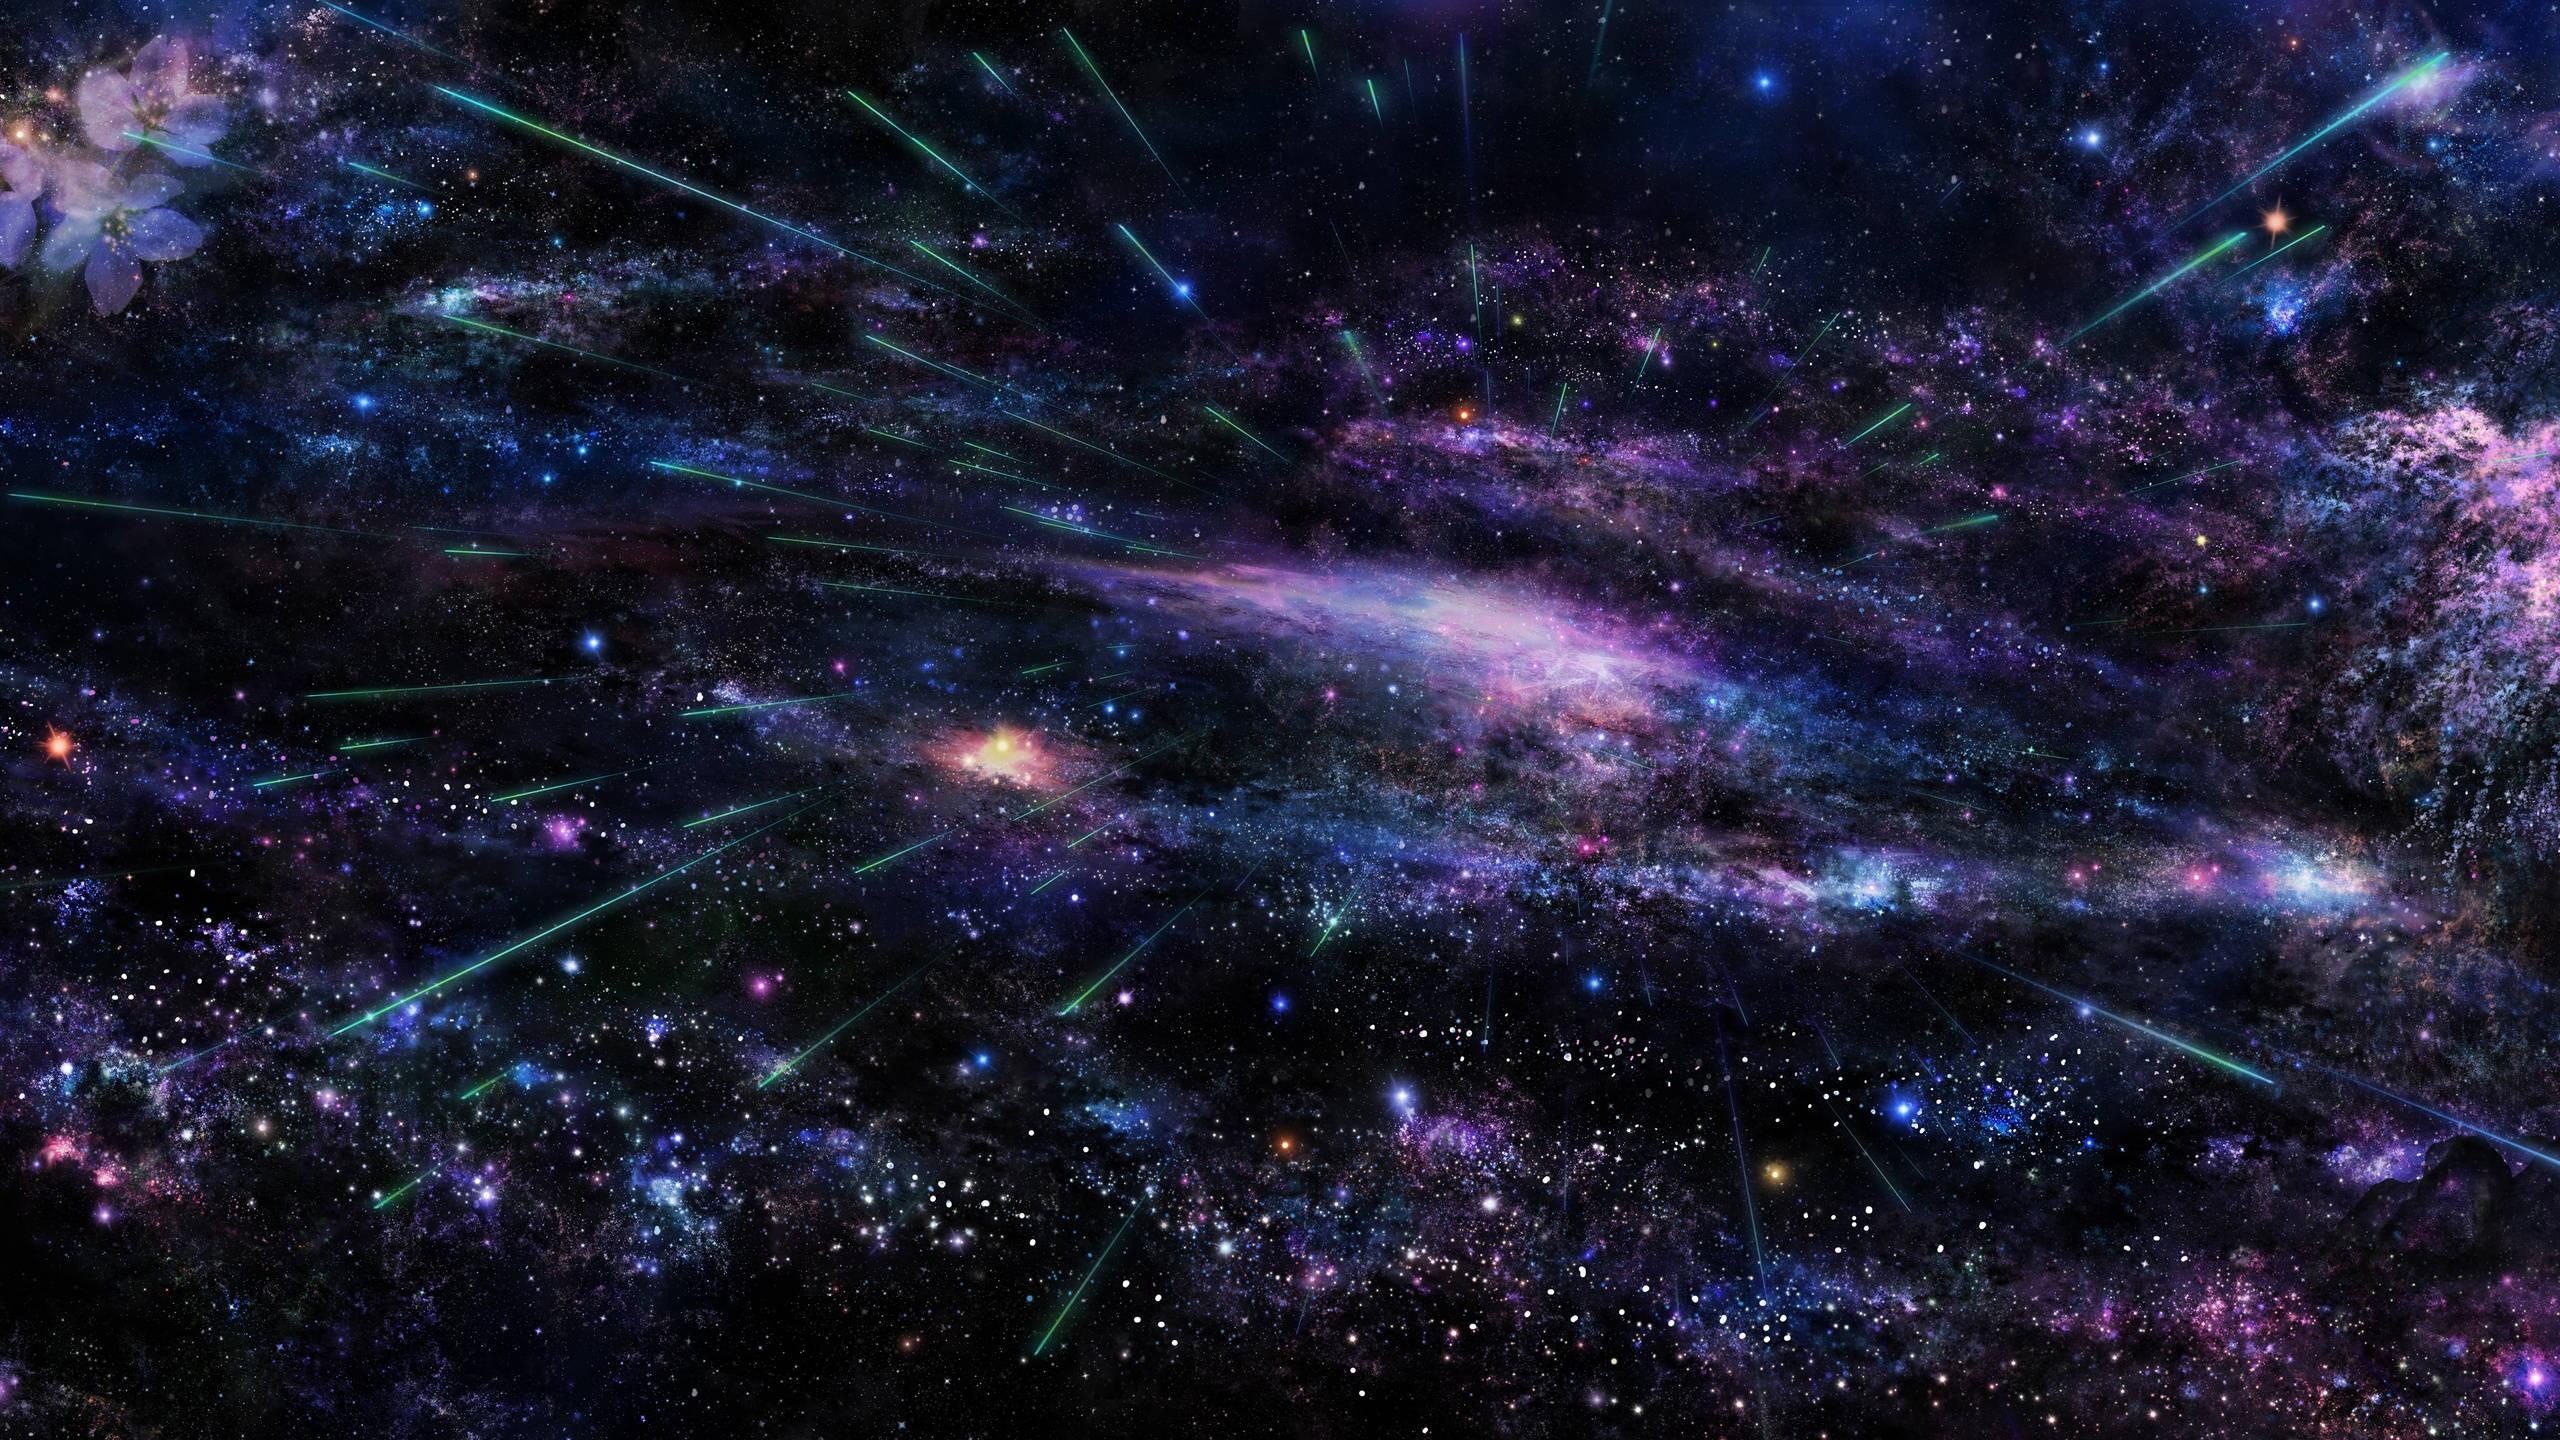 Wallpaper Colorful Digital Art Abstract Galaxy Stars